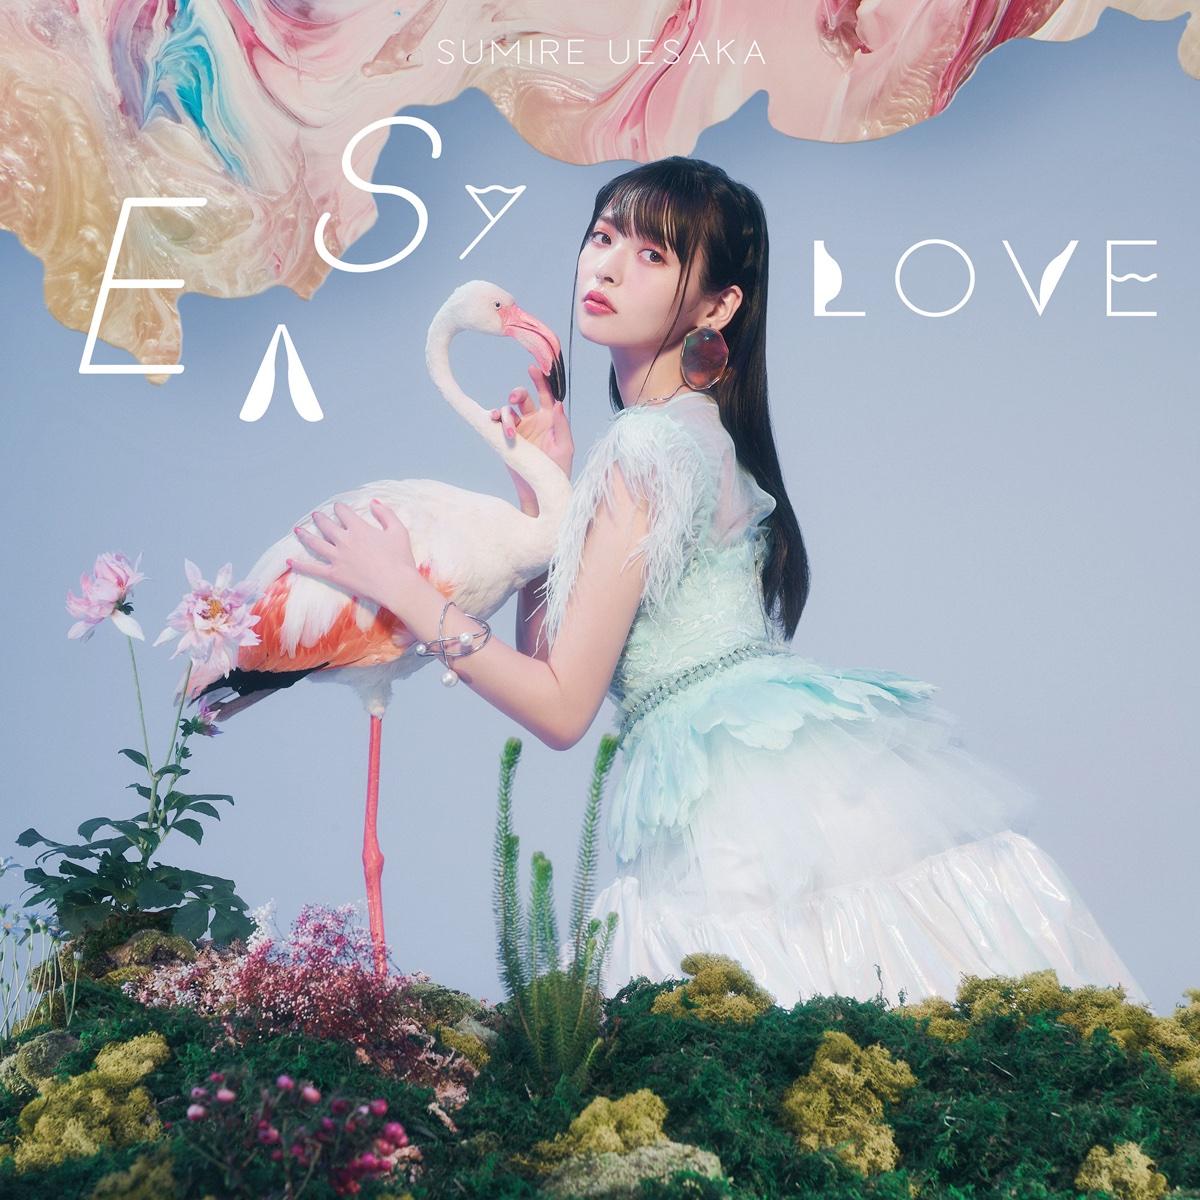 Uesaka Sumire - EASY LOVE